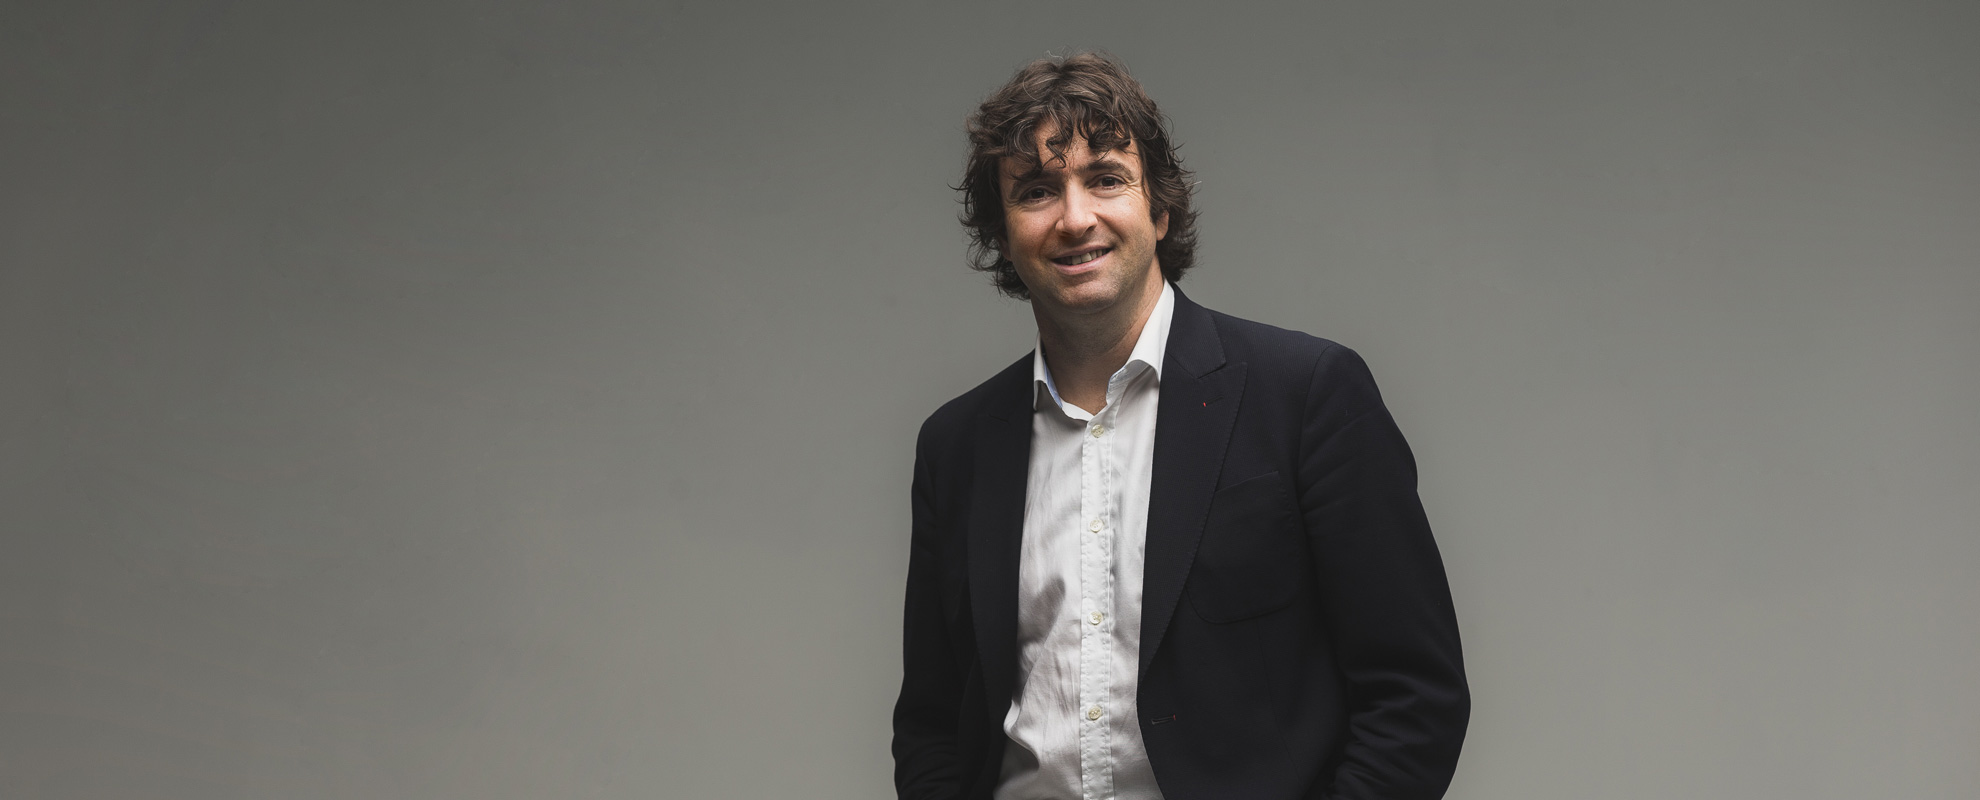 biografia-oliver-diaz-director-orquesta